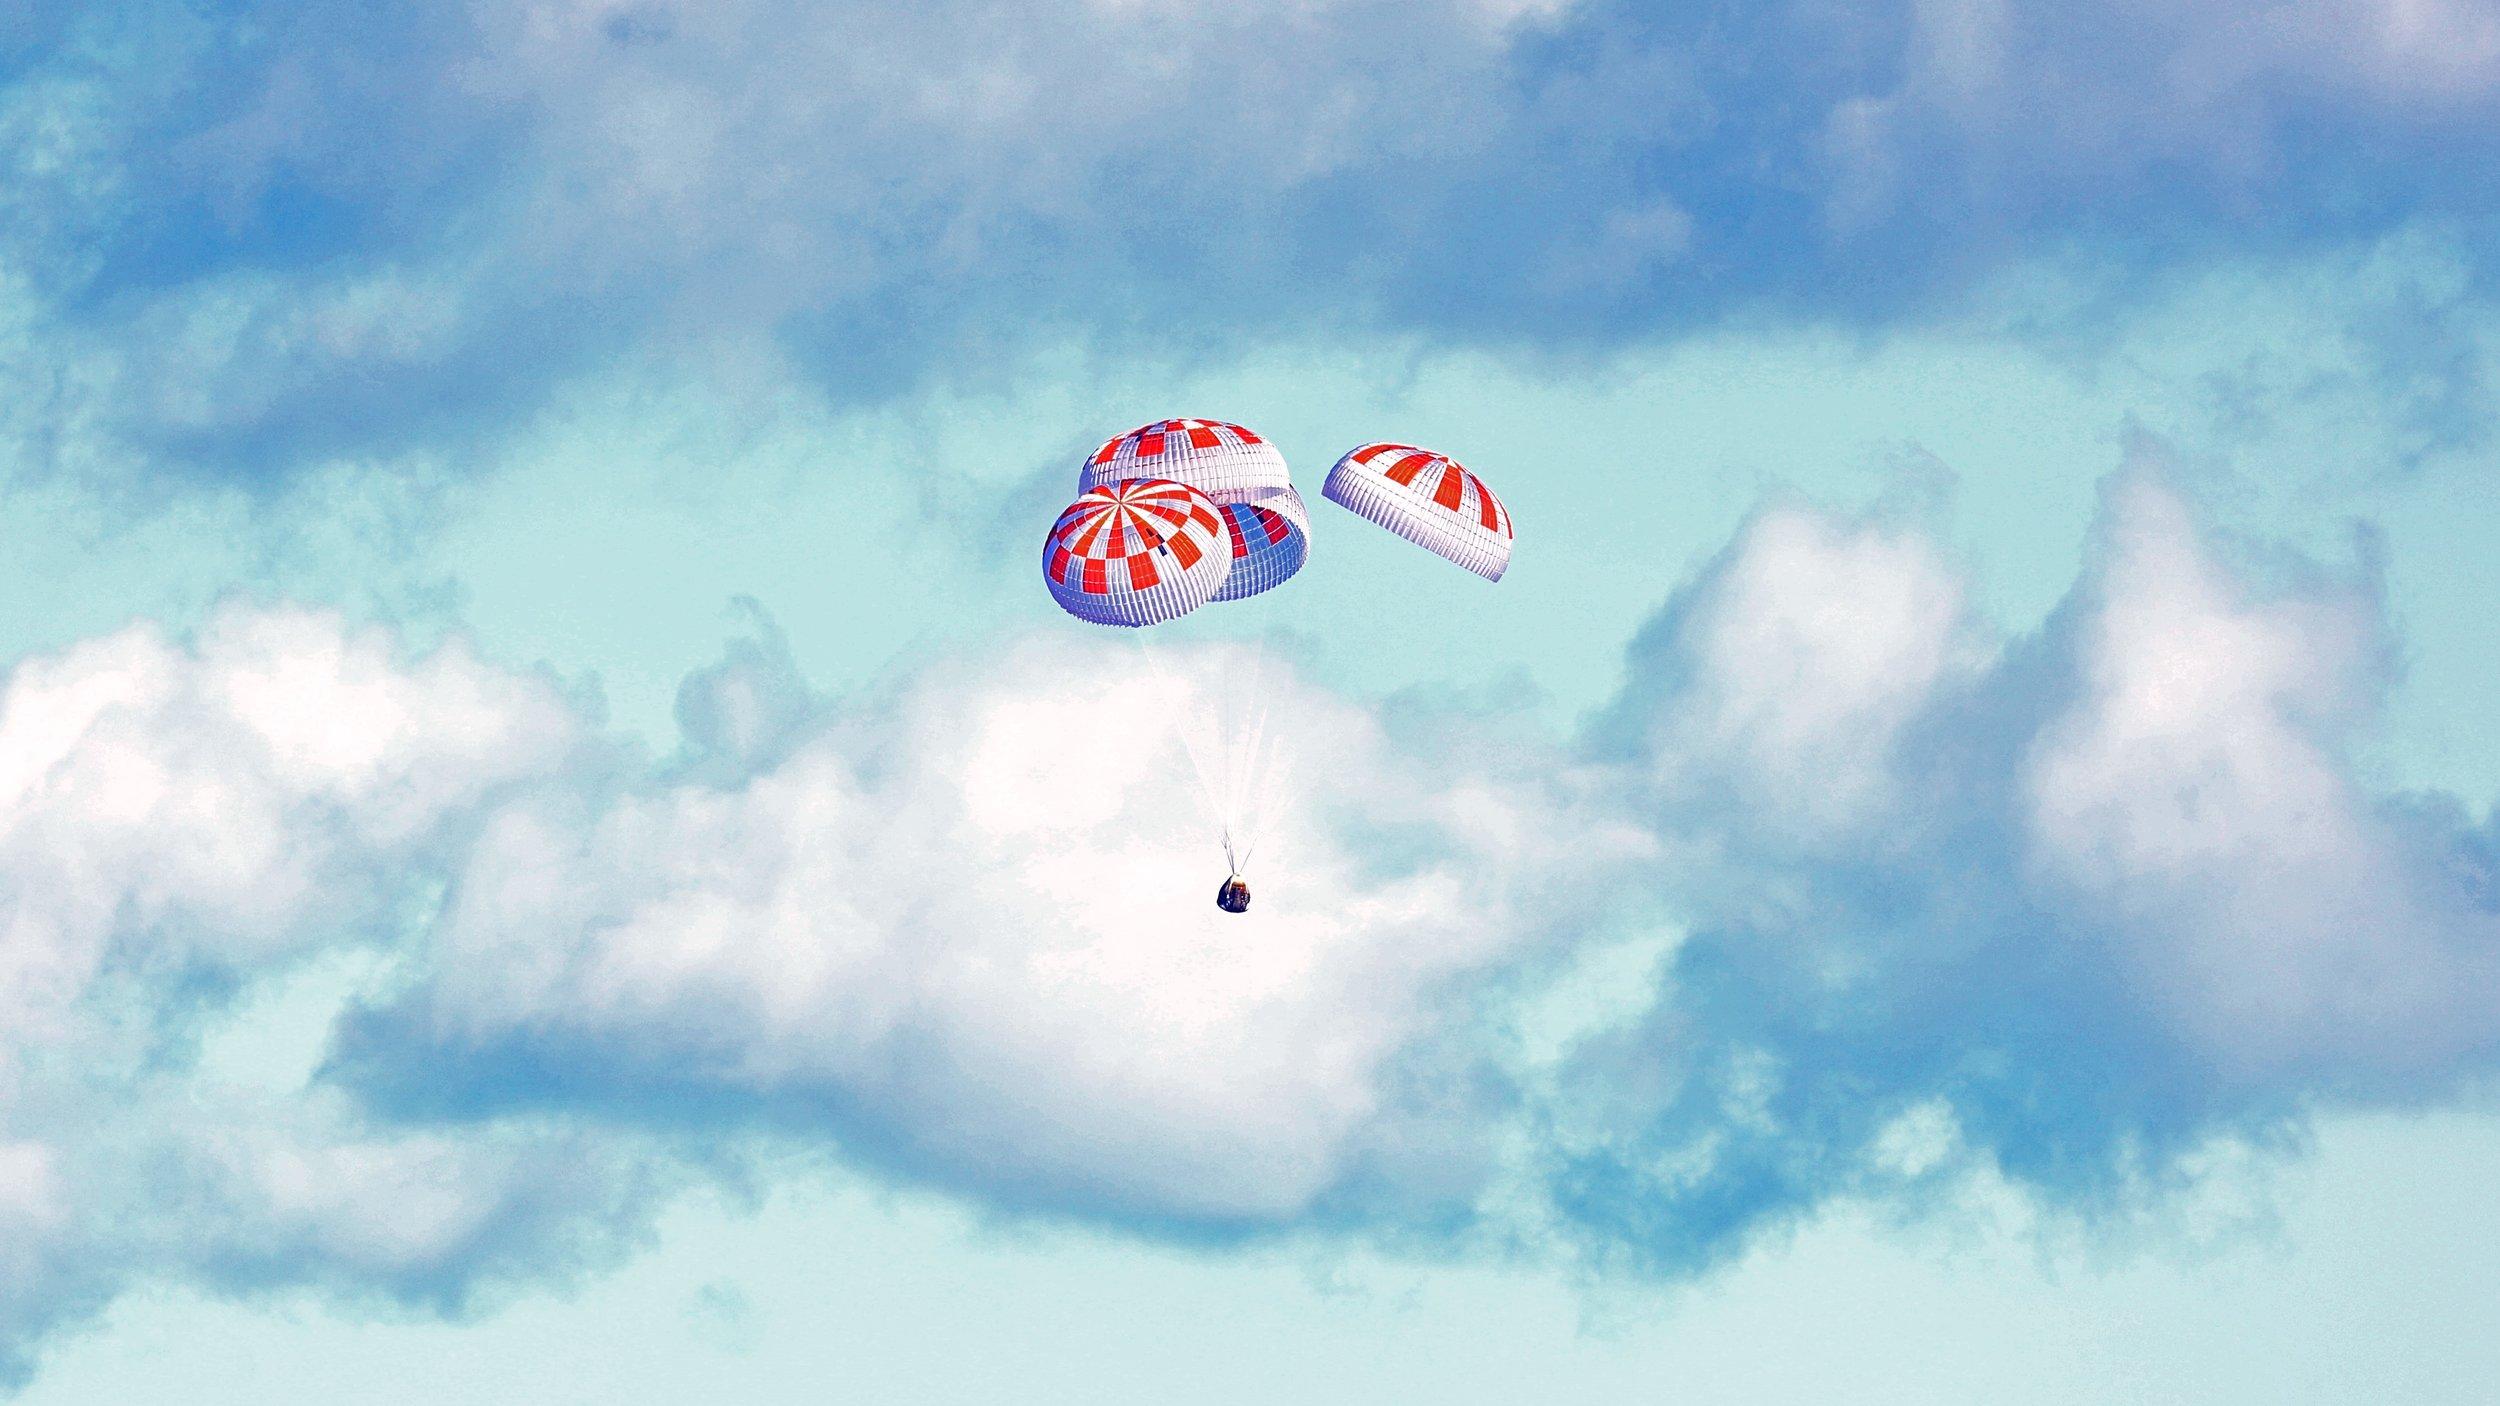 Crew Dragon descends under four parachutes before splashing down in the Atlantic Ocean. Credit: NASA